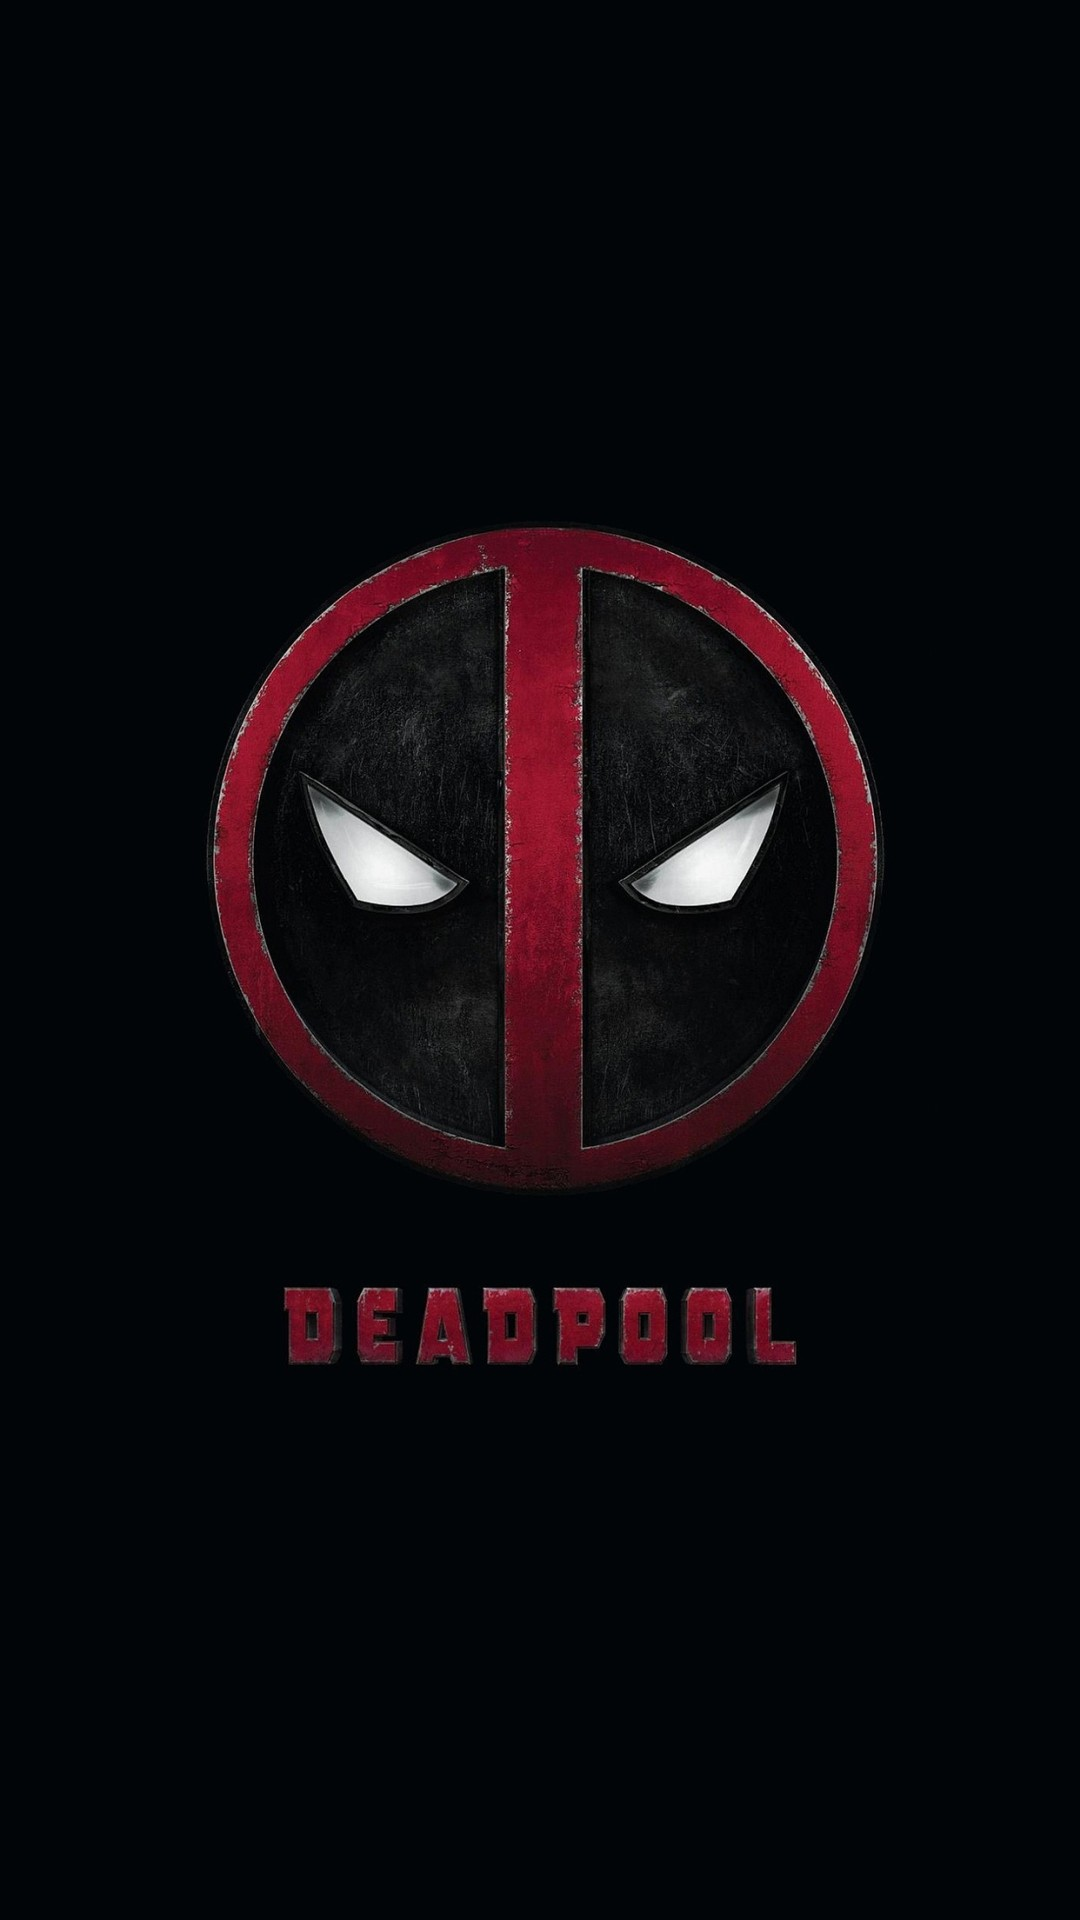 Hd wallpaper for iphone 6 – Deadpool Logo Iphone 6 Plus Hd Wallpaper